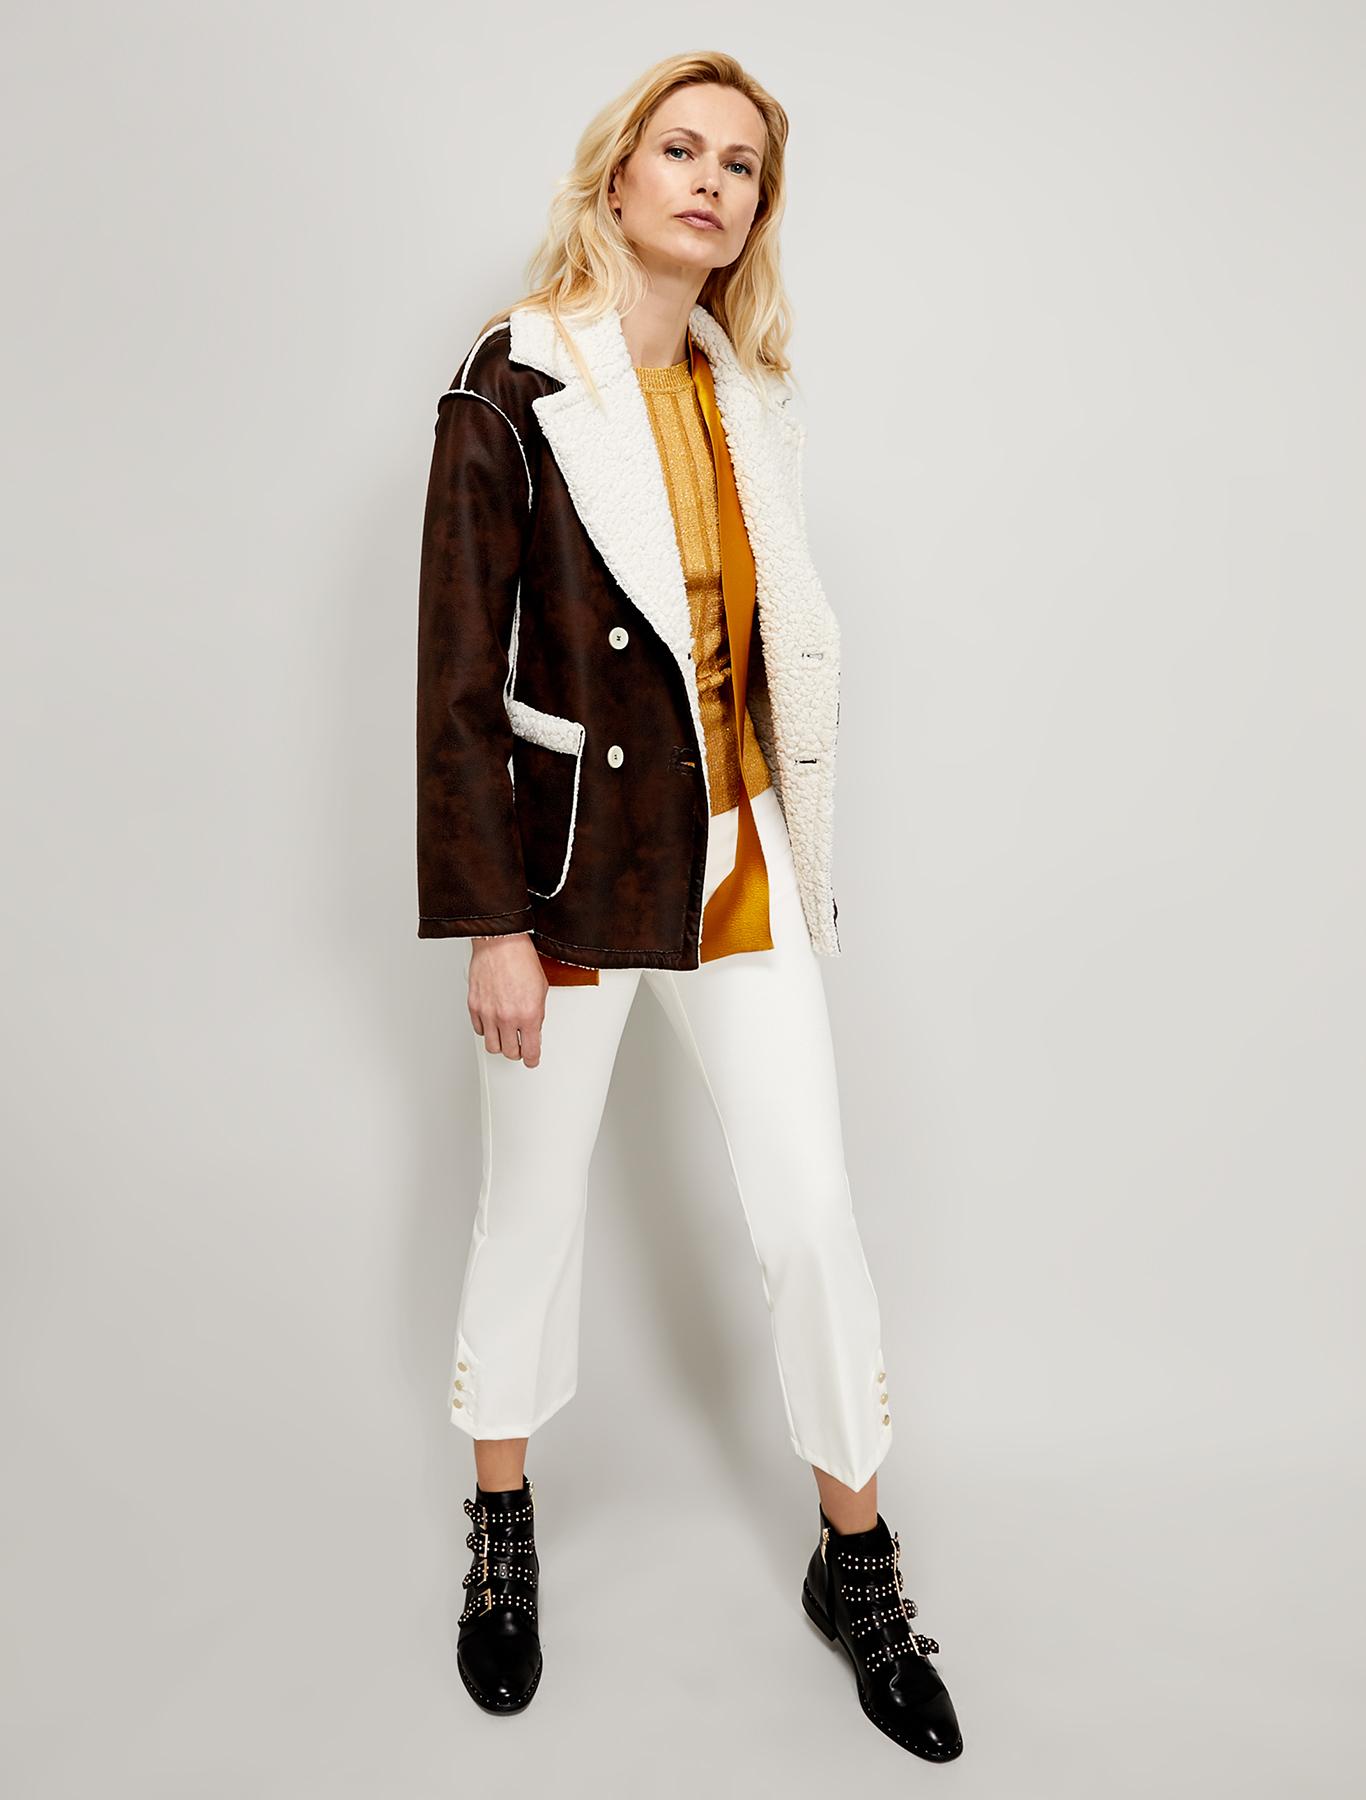 Kick-flare trousers - ivory - pennyblack